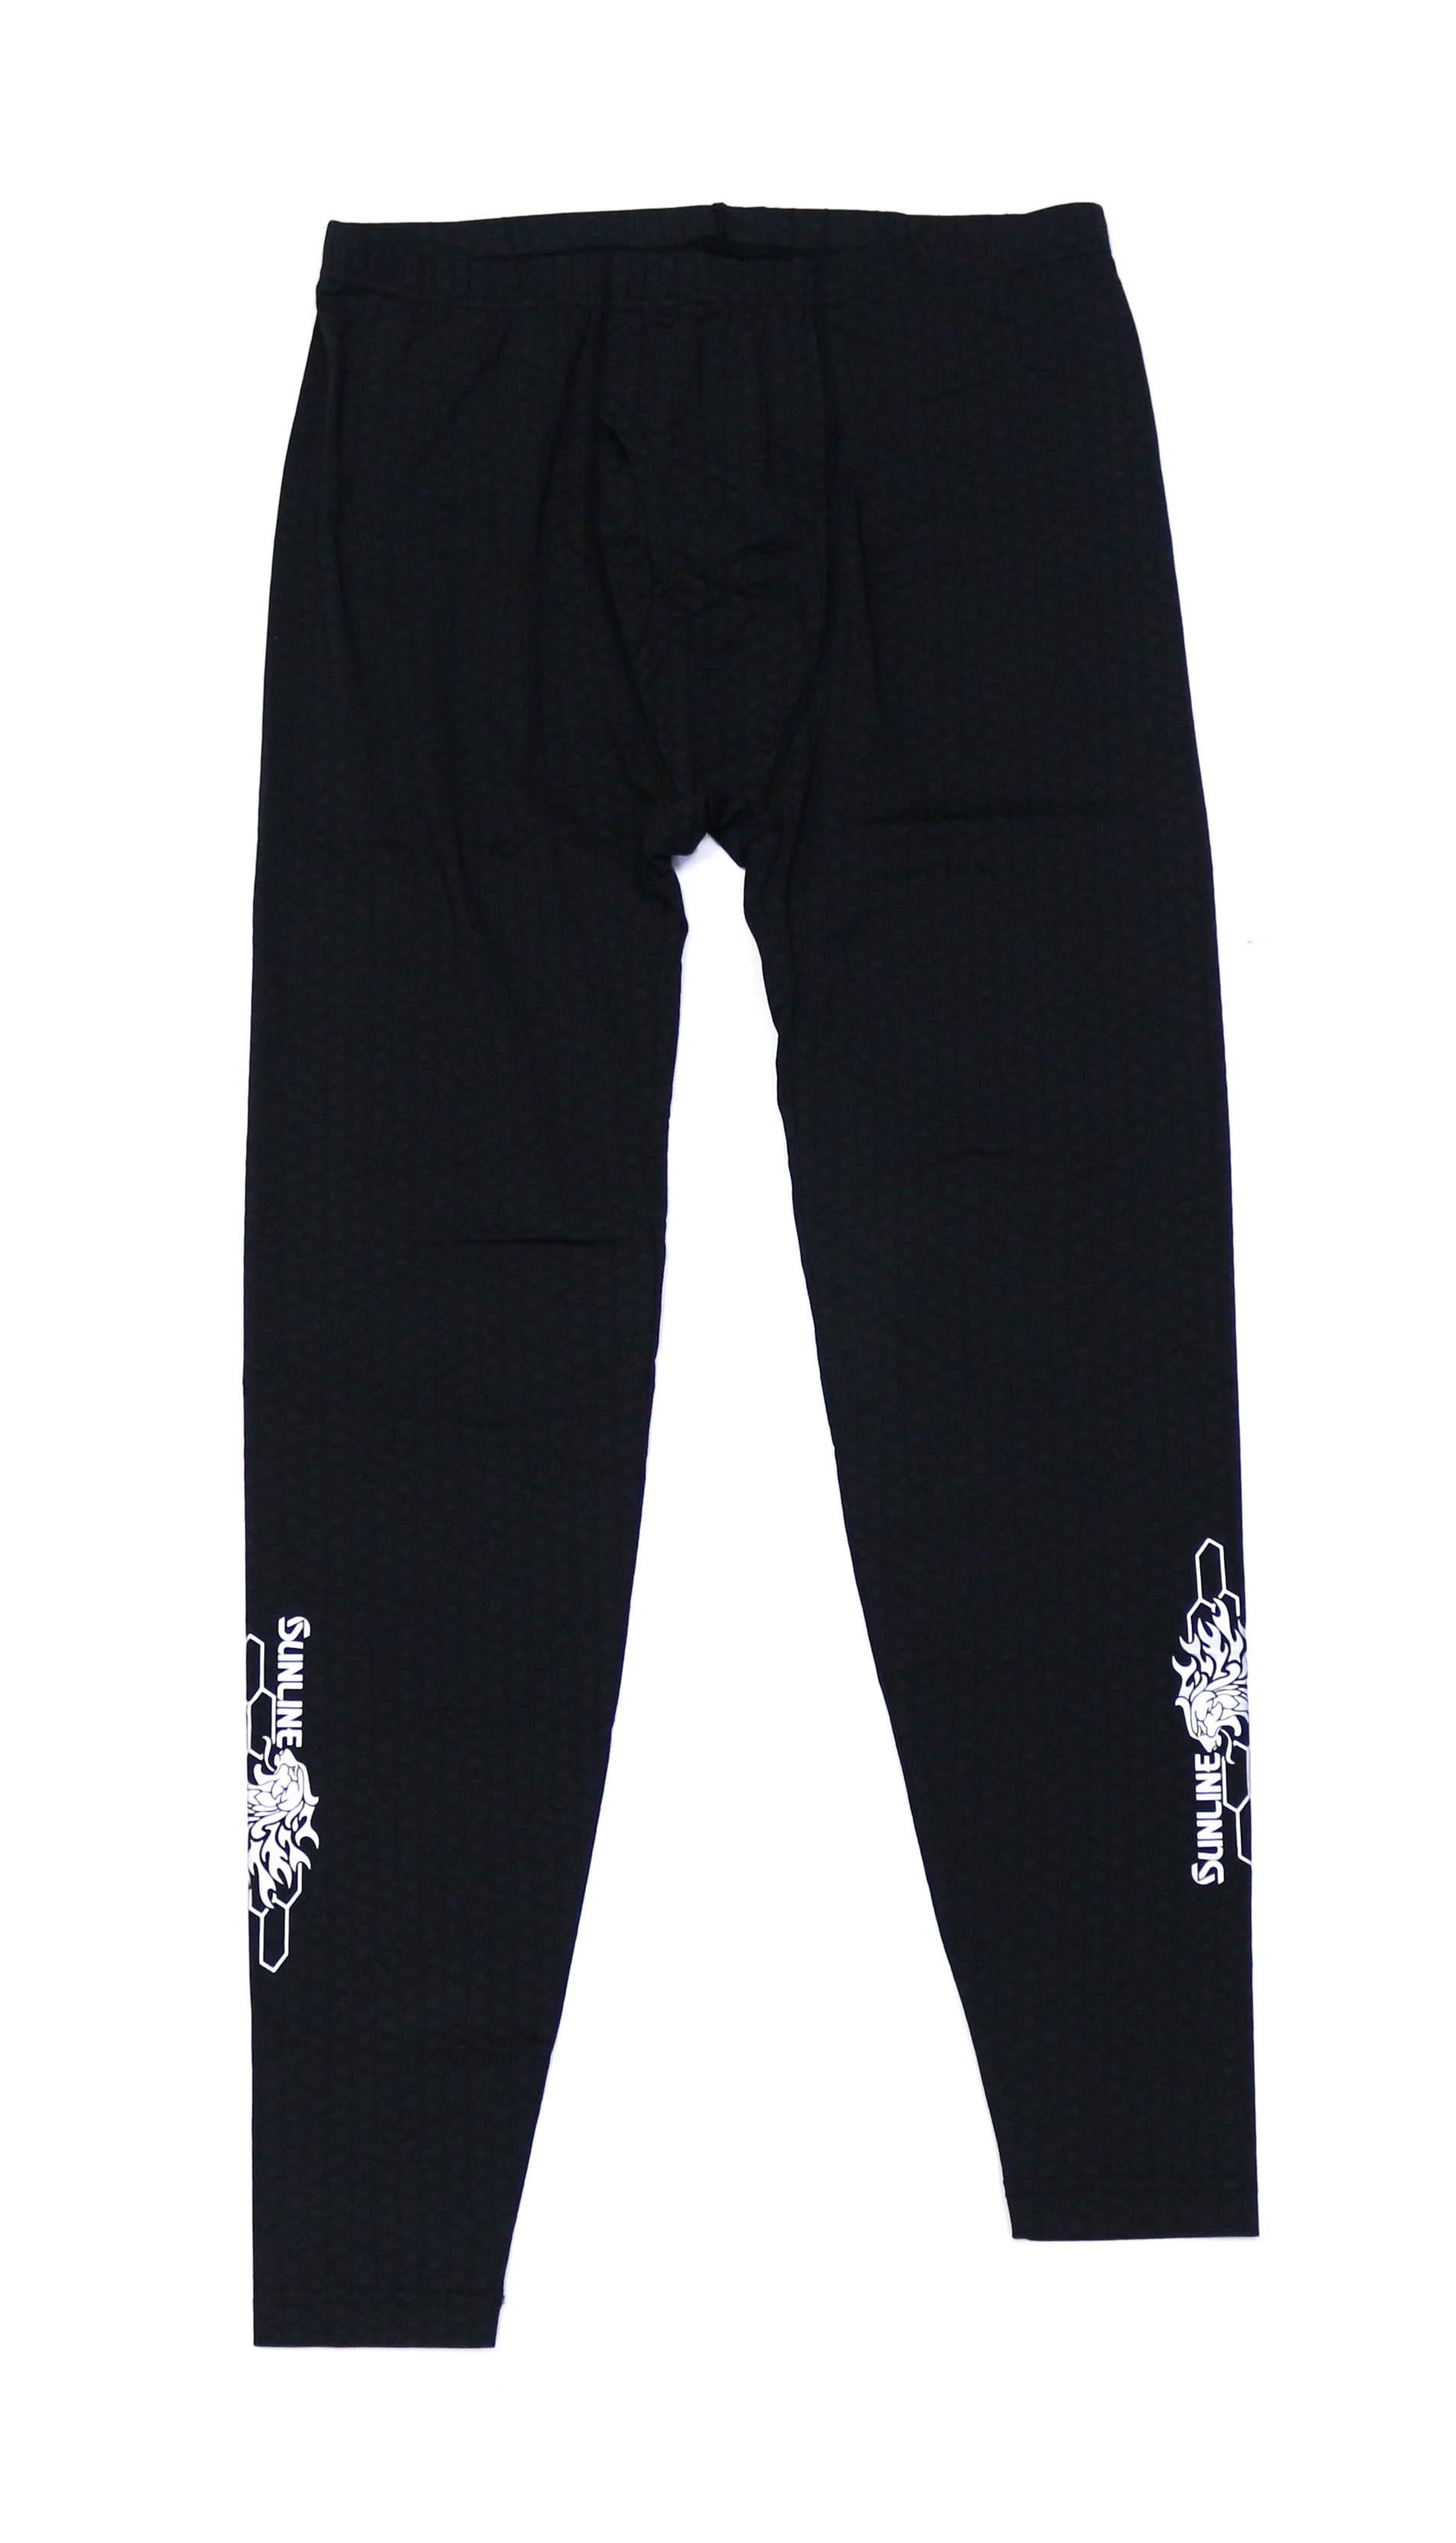 Sunline SUW-5536CW Underpants Terax Cool Black Size LL (2495)